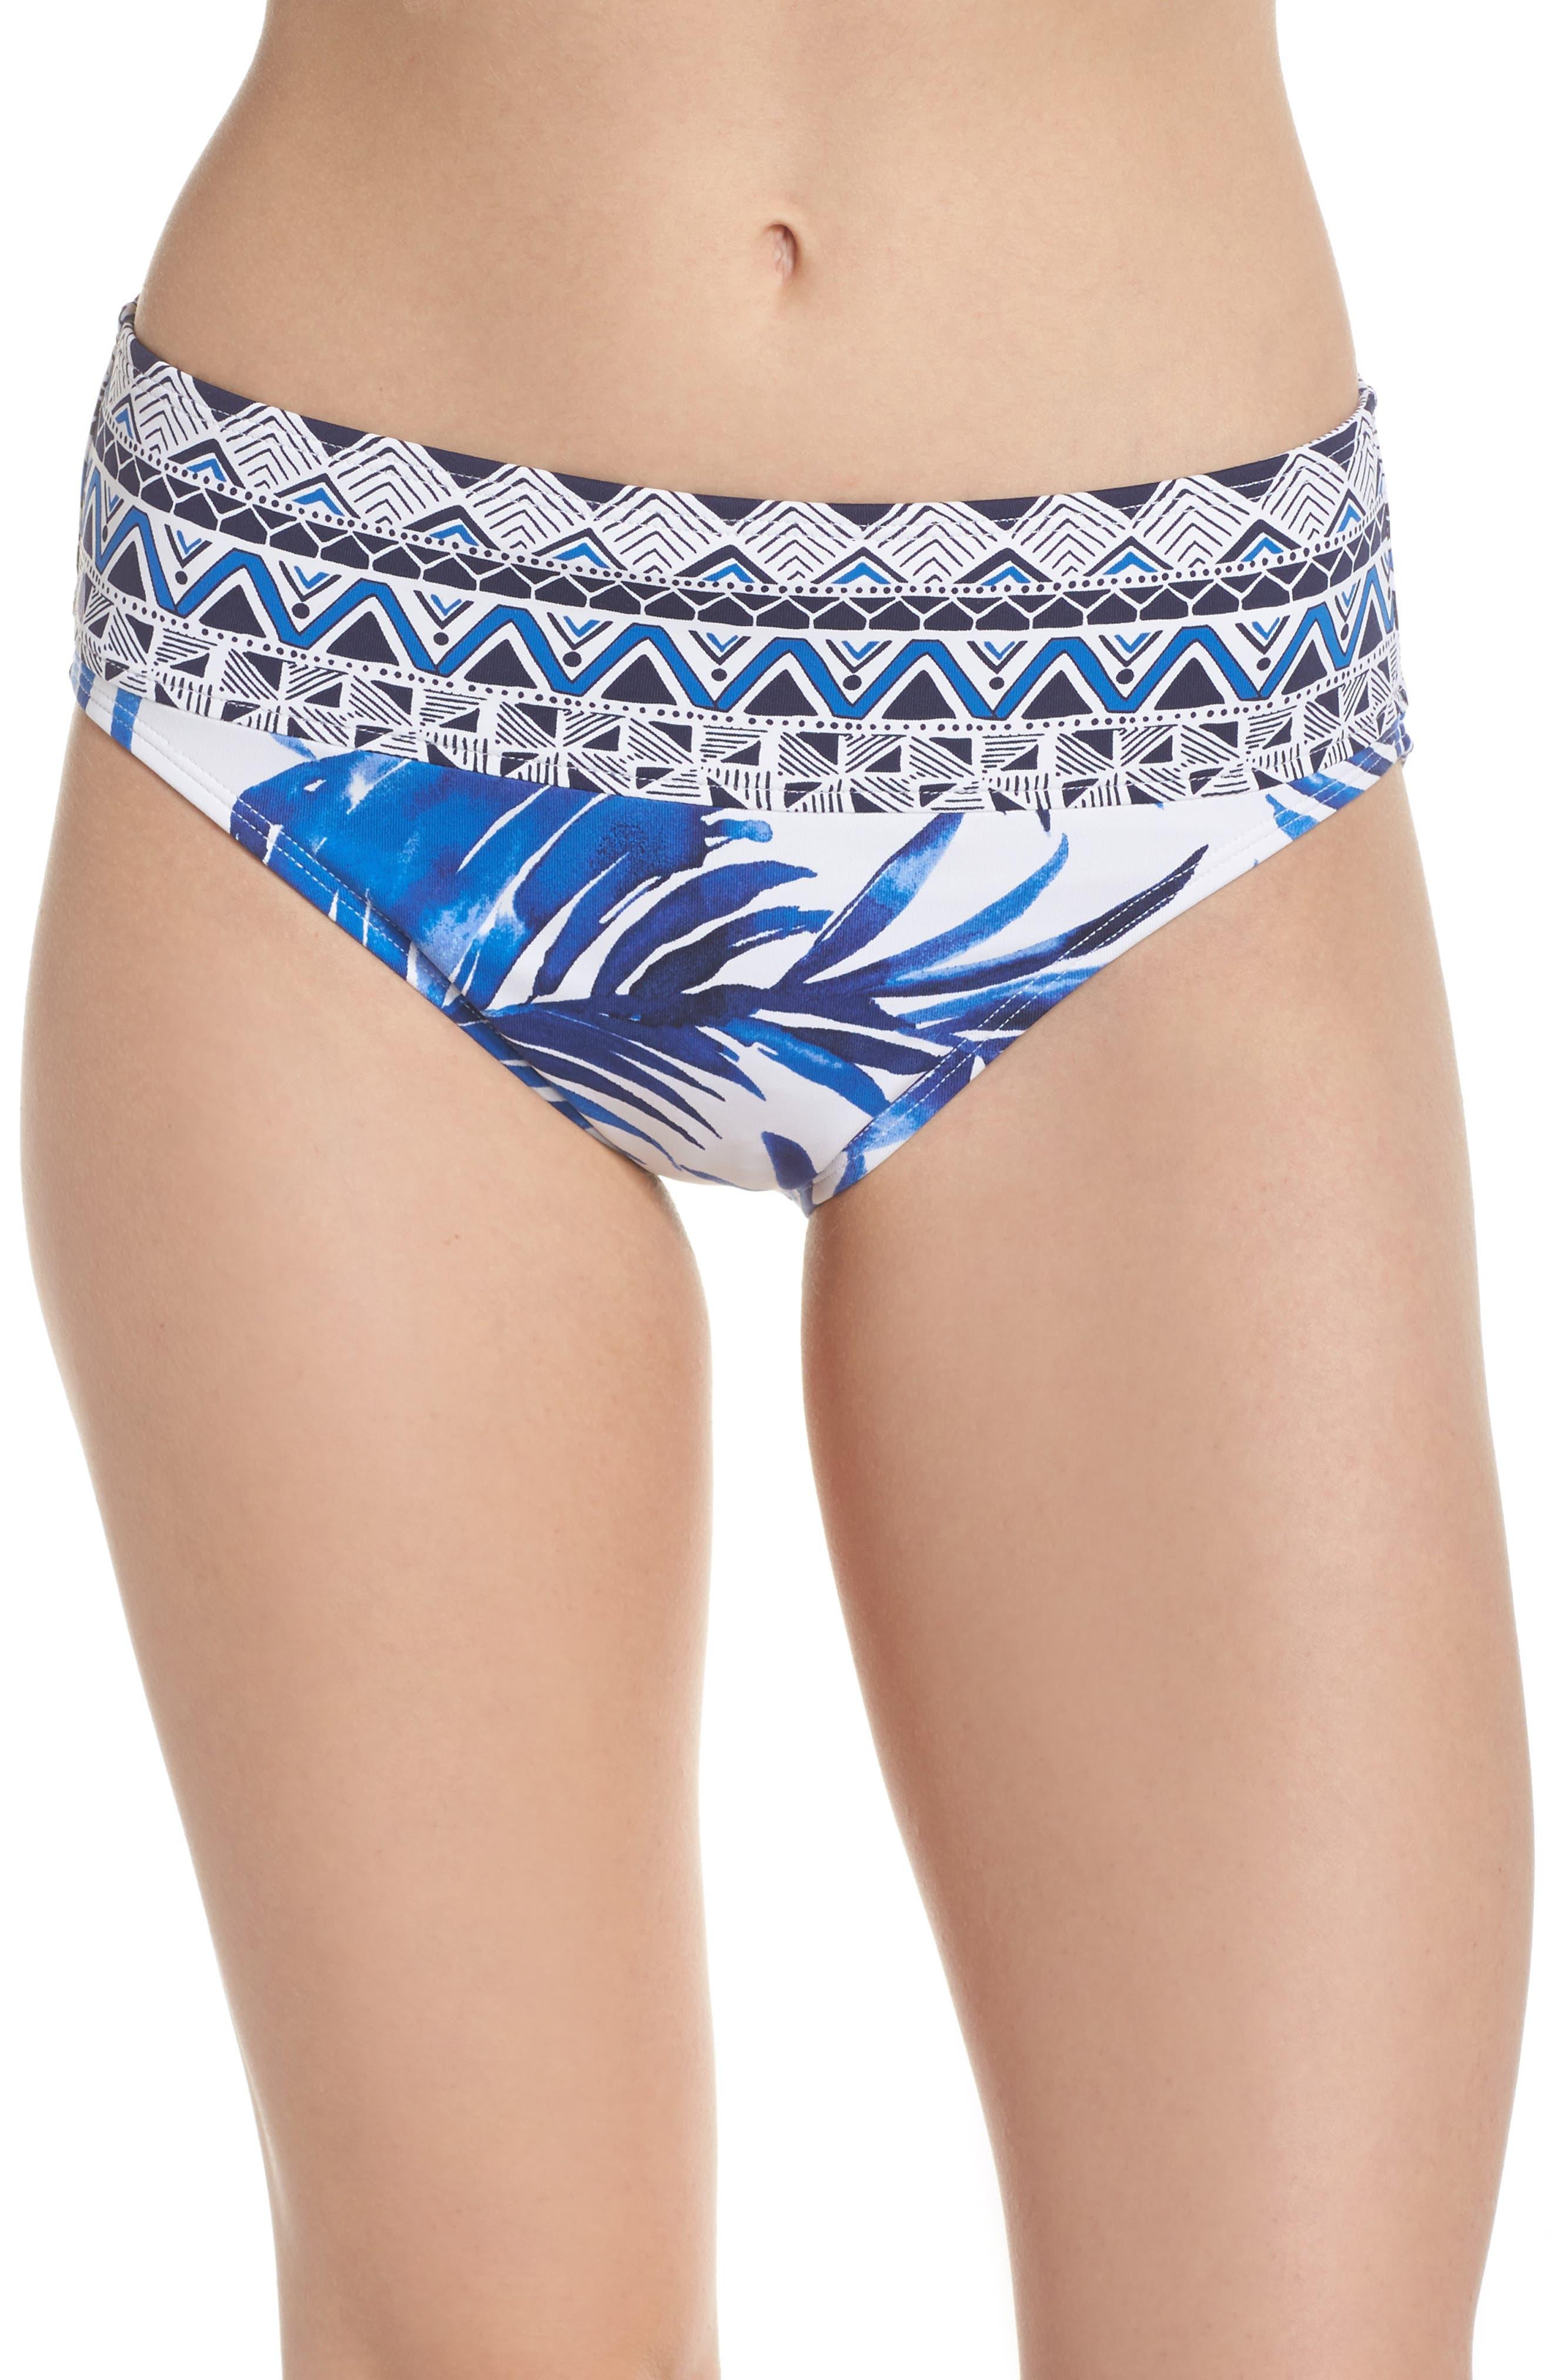 Fuller Fronds High Waist Bikini Bottoms,                             Main thumbnail 1, color,                             WHITE